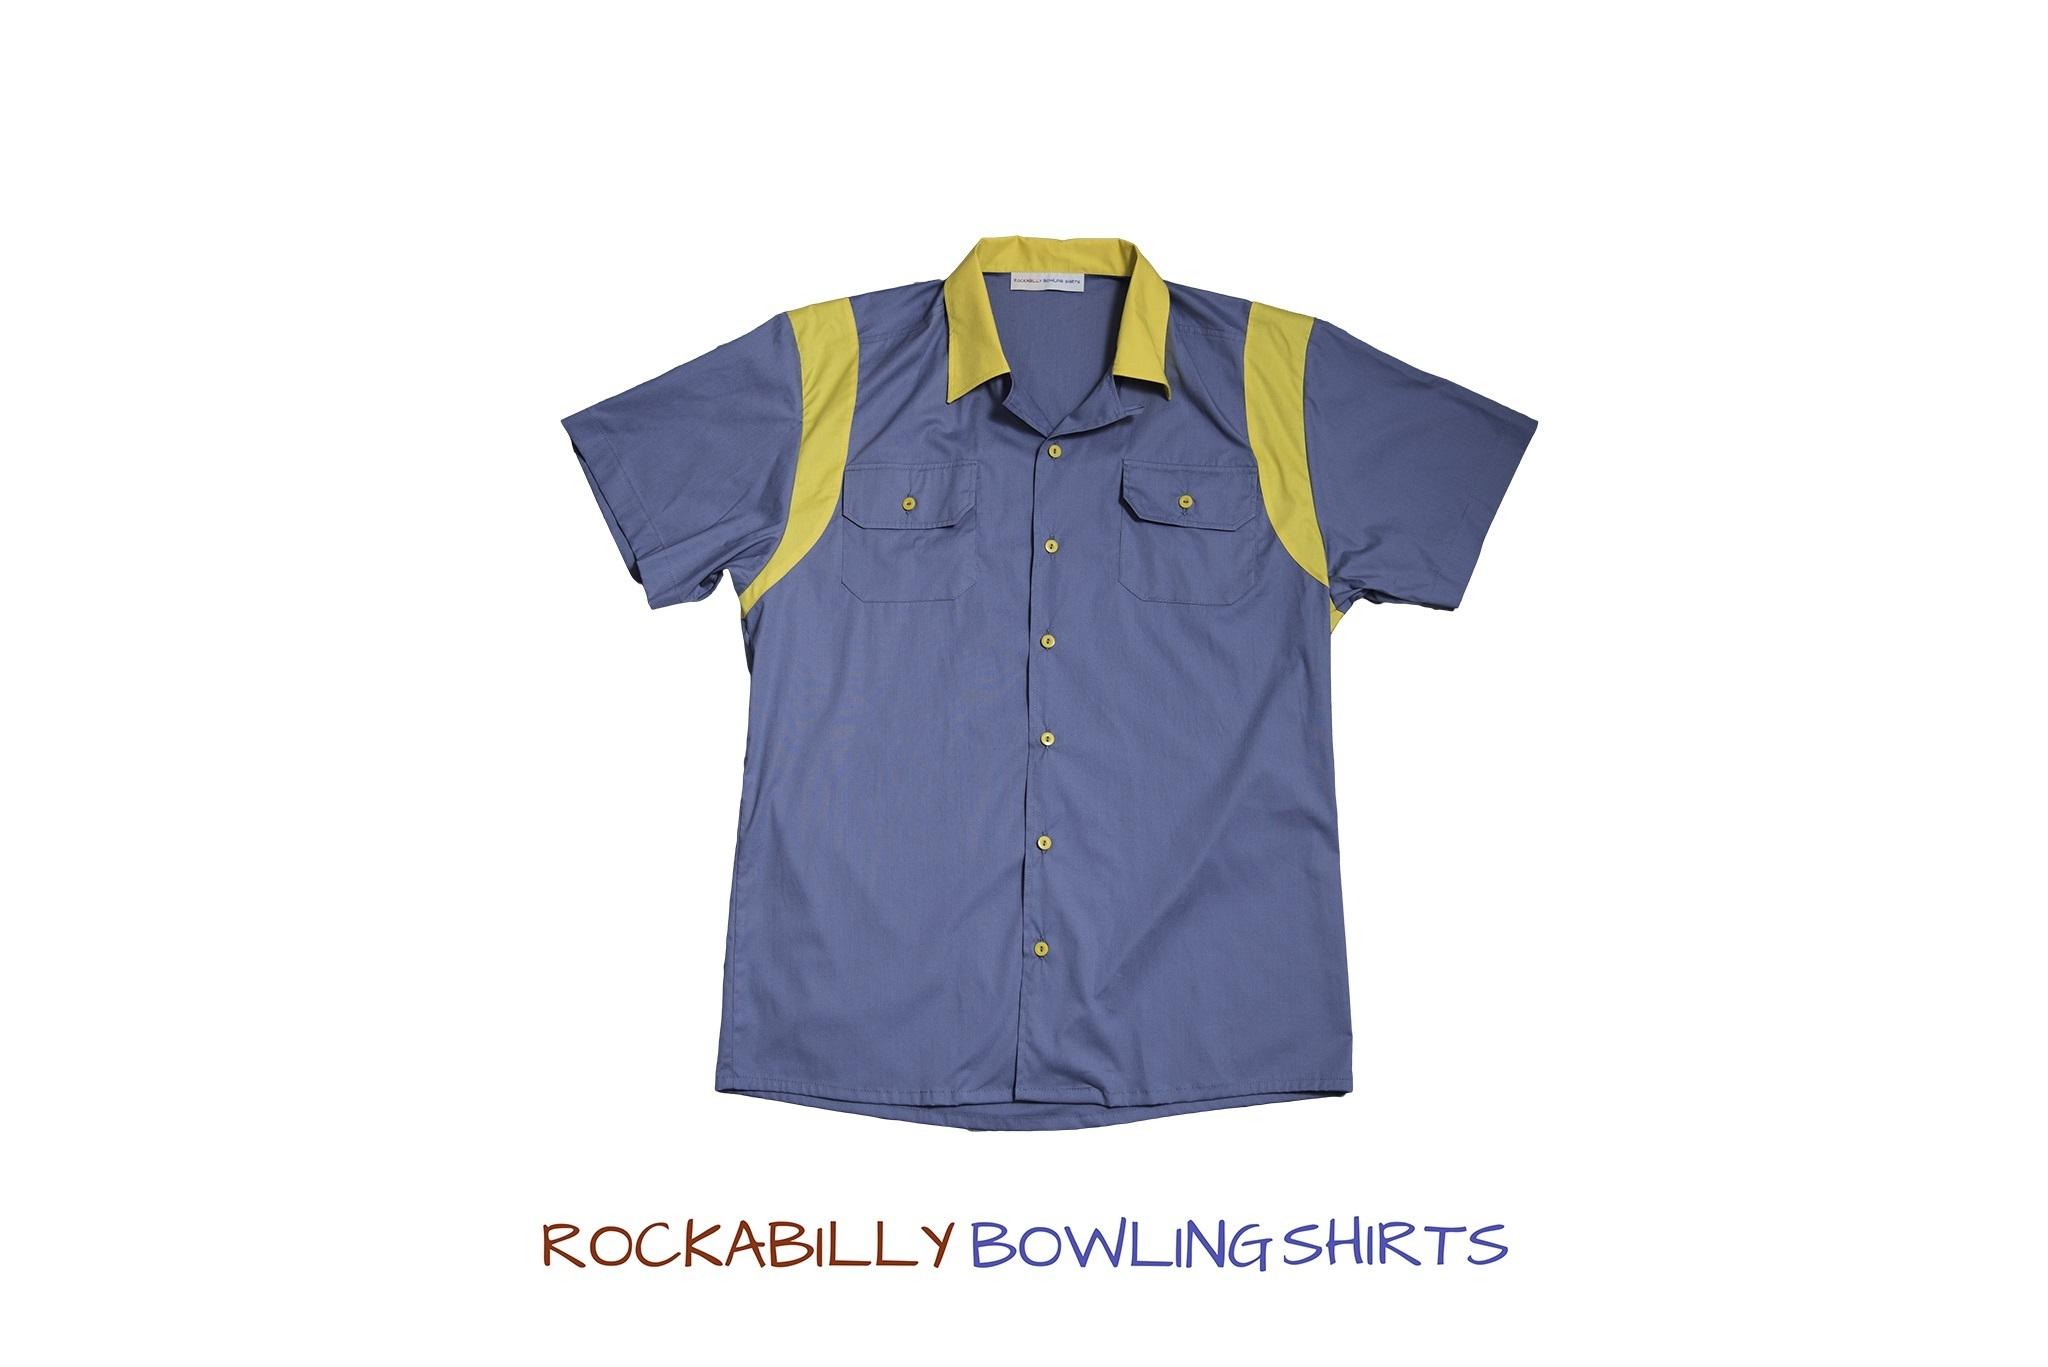 Custom Bowling Shirts Australia Joe Maloy